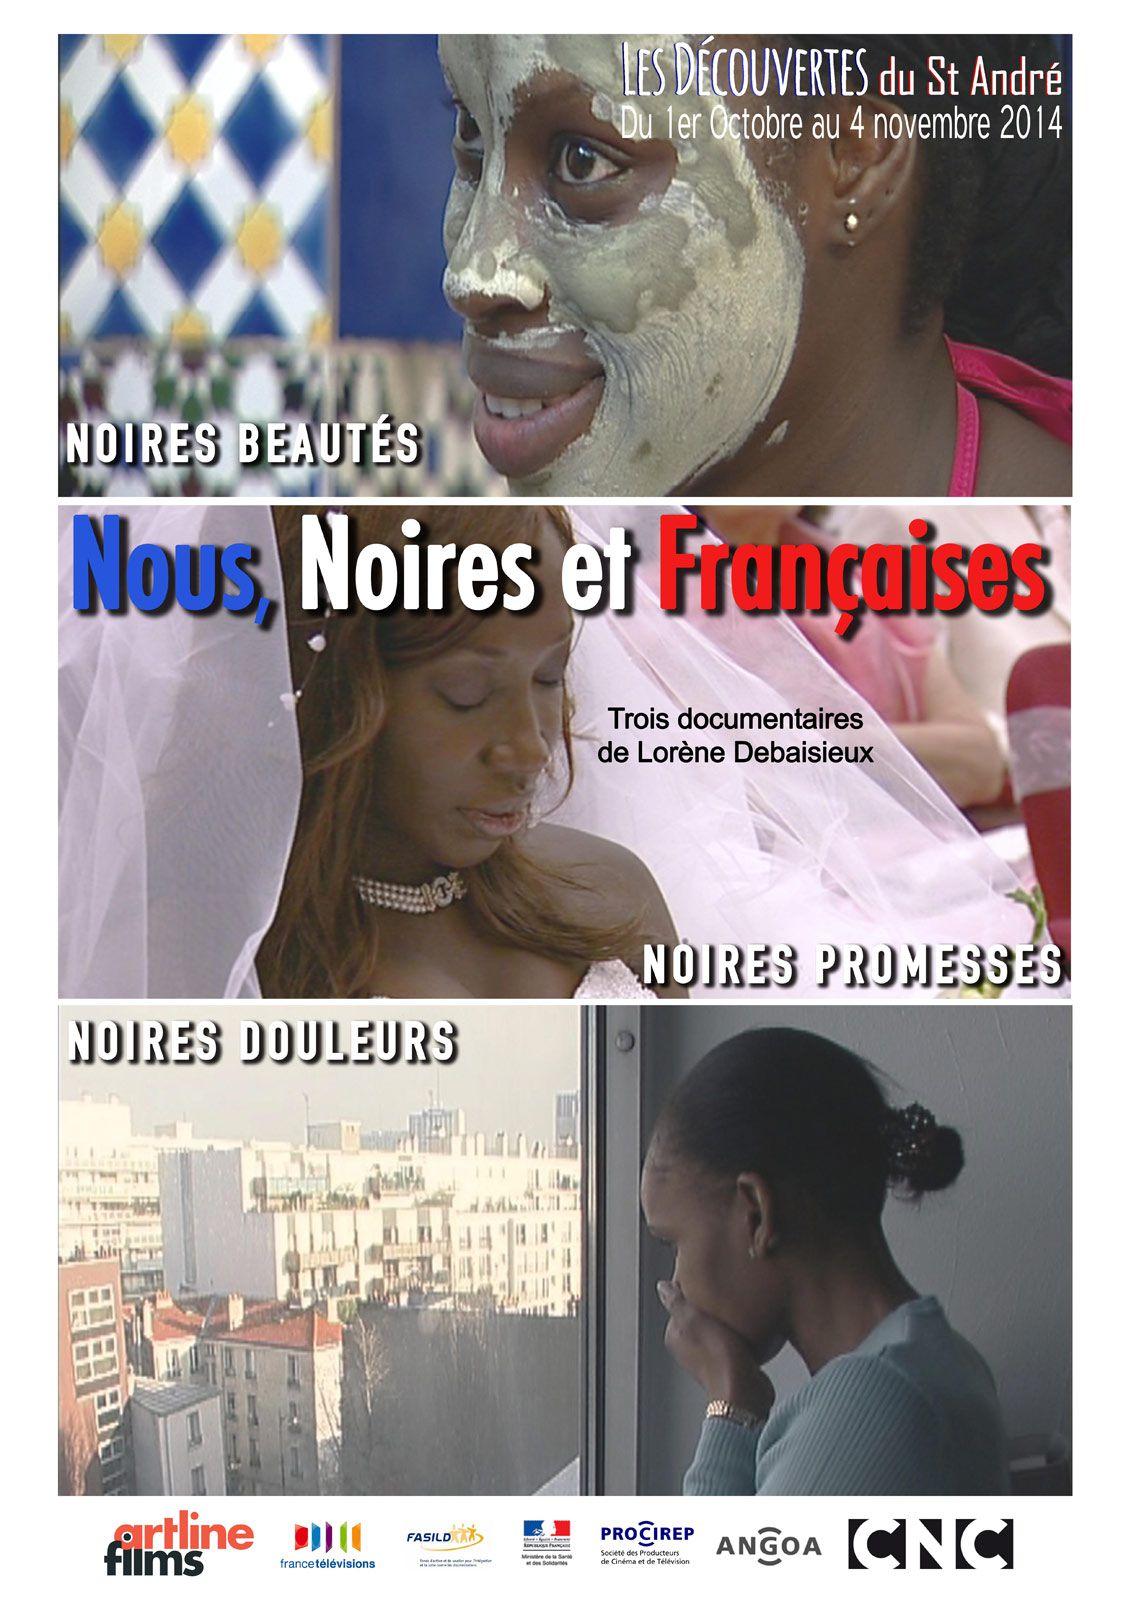 Noires Promesses - Documentaire (2006)